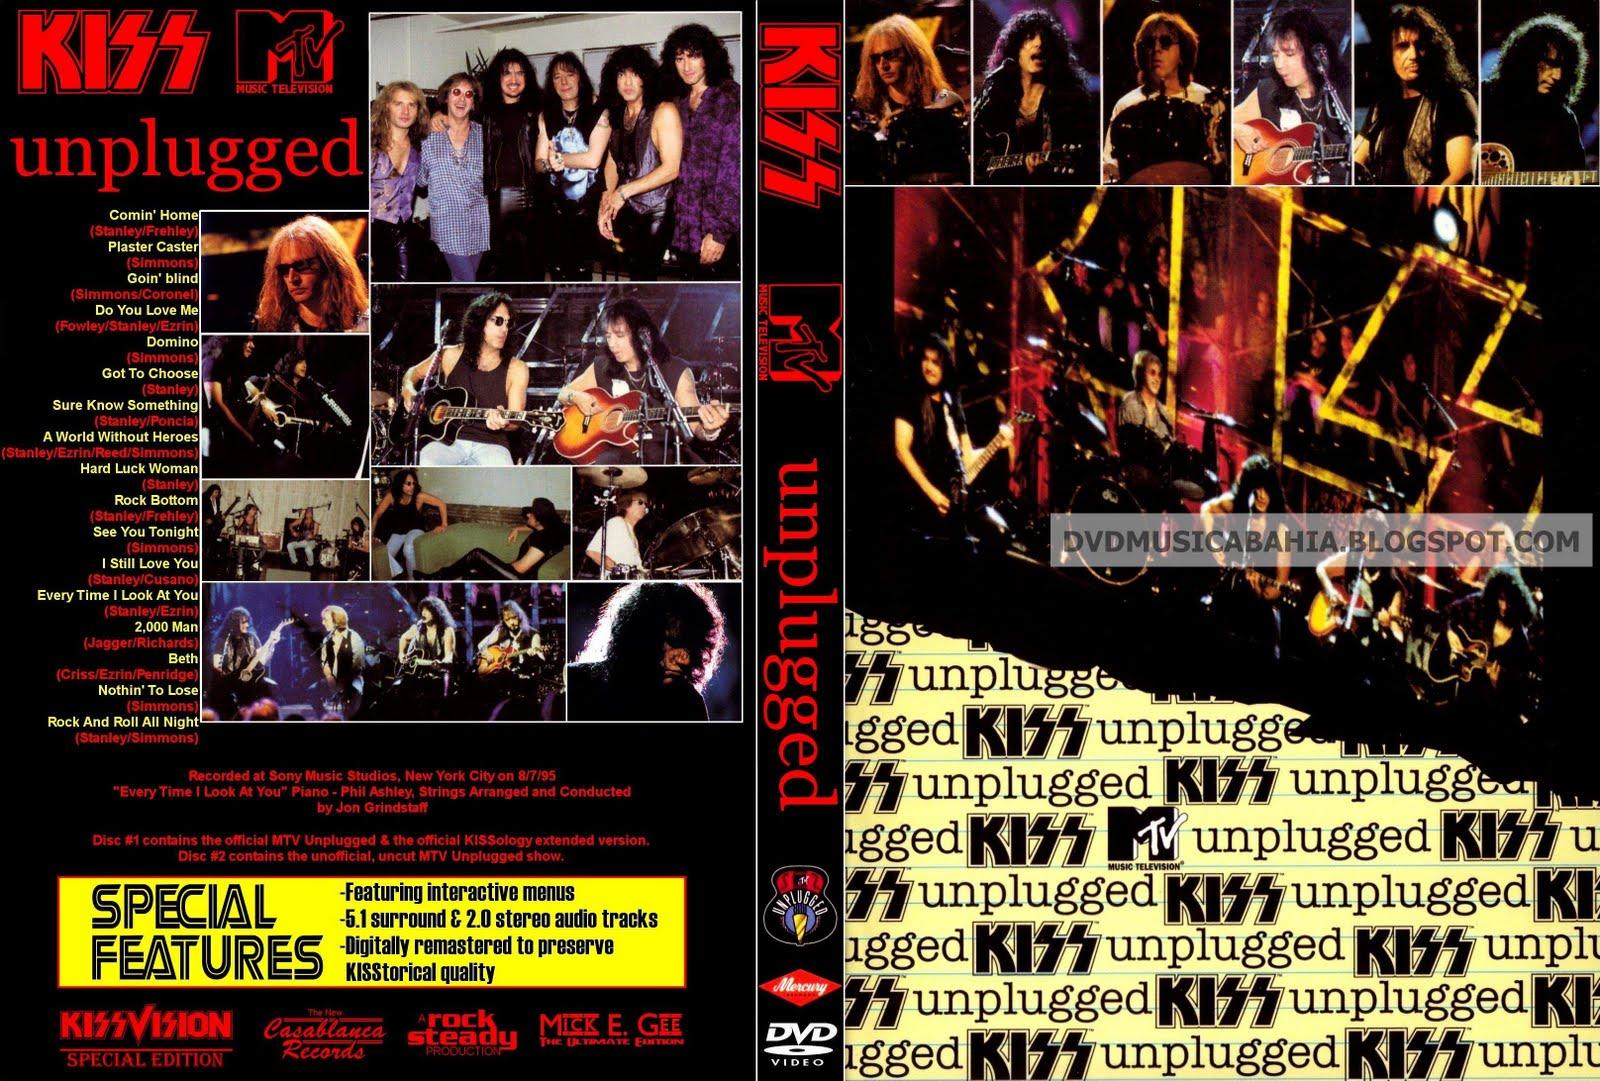 http://4.bp.blogspot.com/_PiUVny6RPwY/TCjsoB8NO1I/AAAAAAAAAvQ/bYUQJwGh_vk/s1600/kiss+-+Mtv+Unplugged.jpg